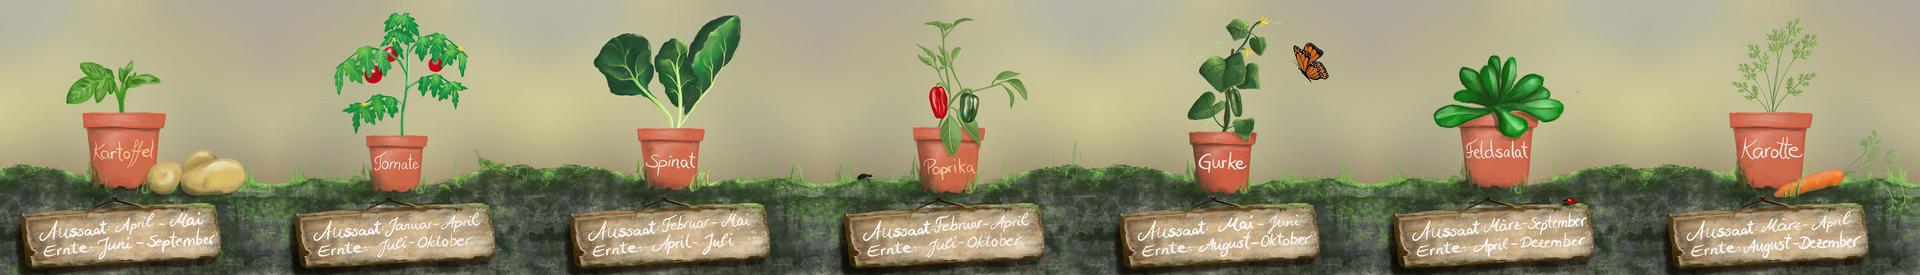 Vegetables (commissioned work)